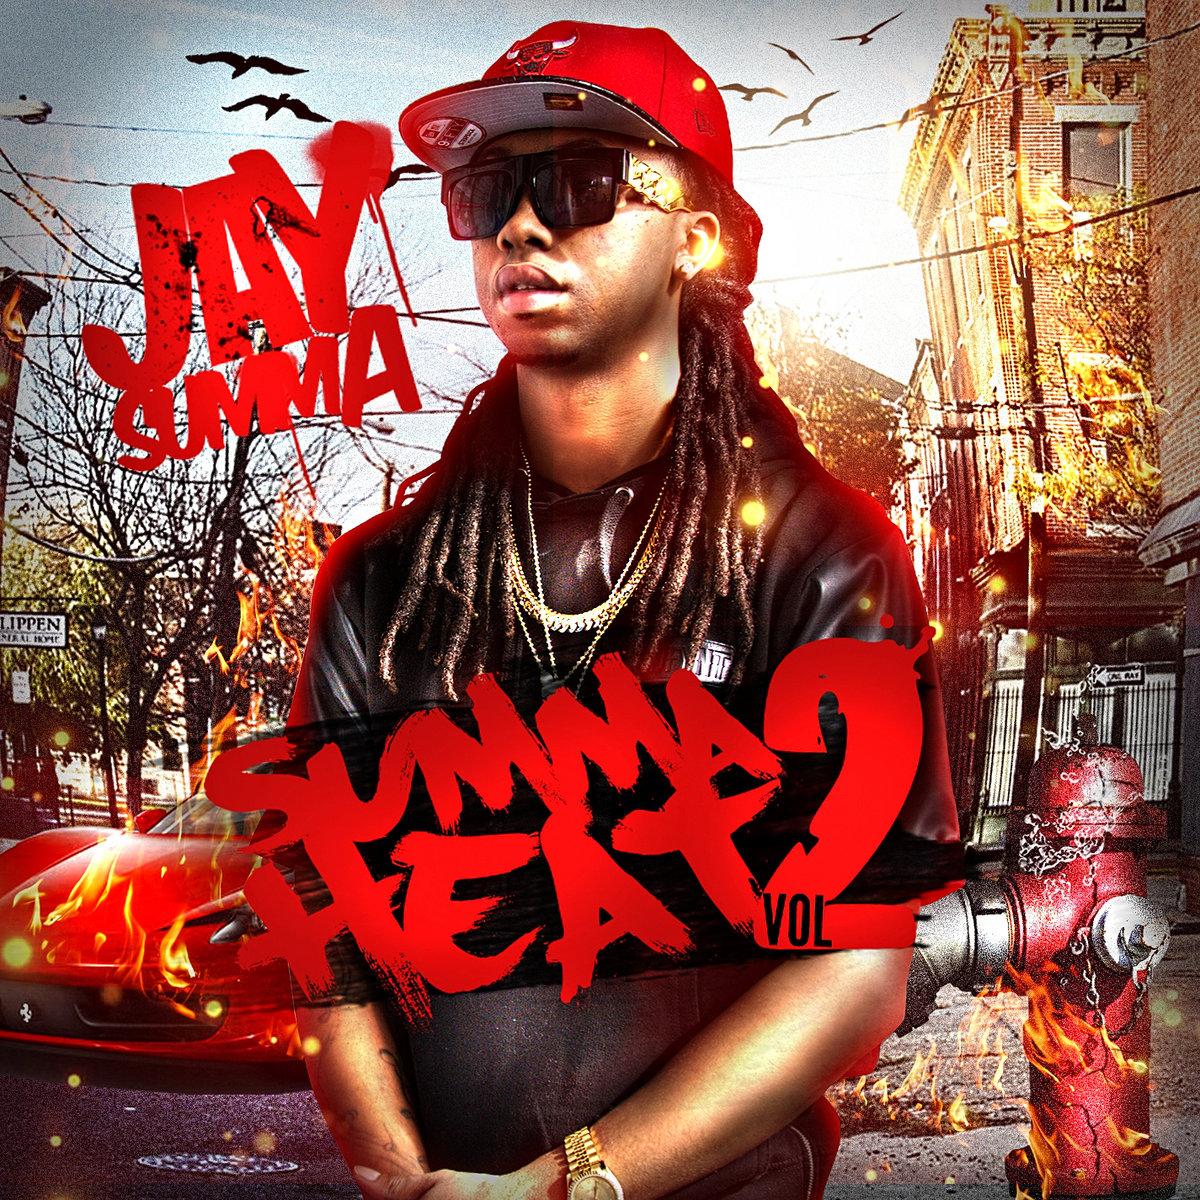 Summa Heat Vol  2 | Jay Summa